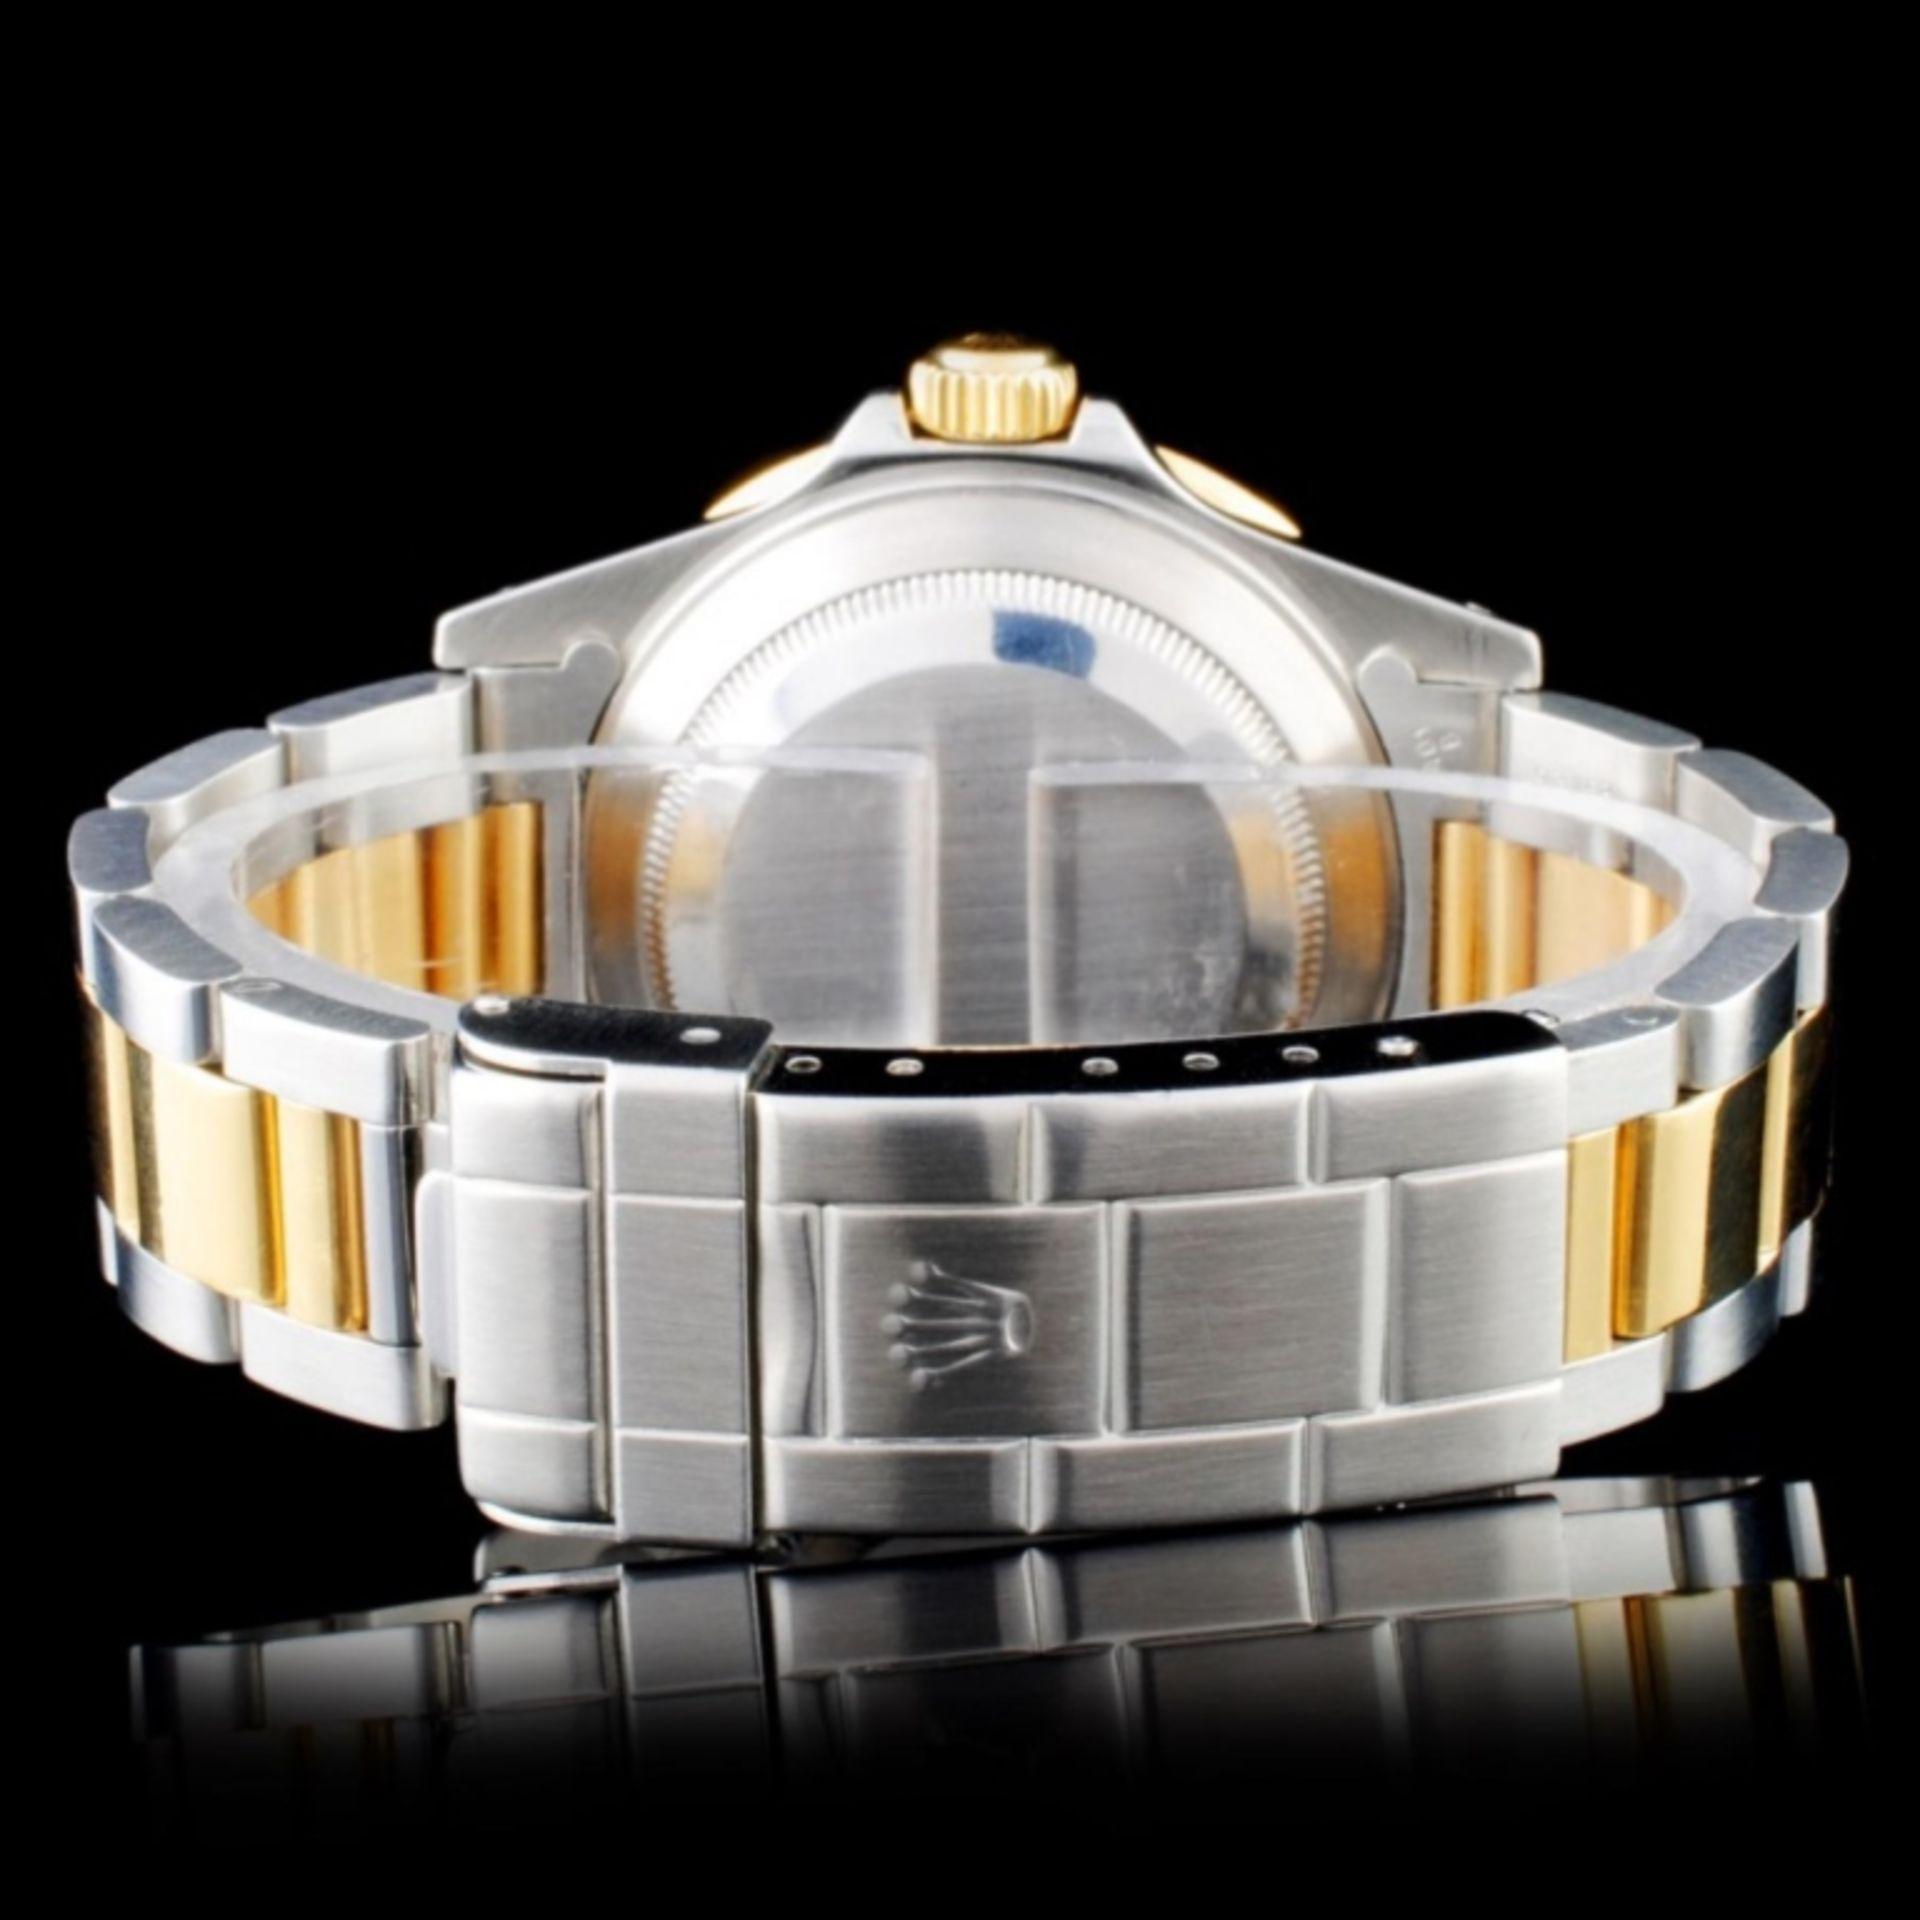 Rolex YG/SS Submariner 40MM Wristwatch - Image 3 of 5